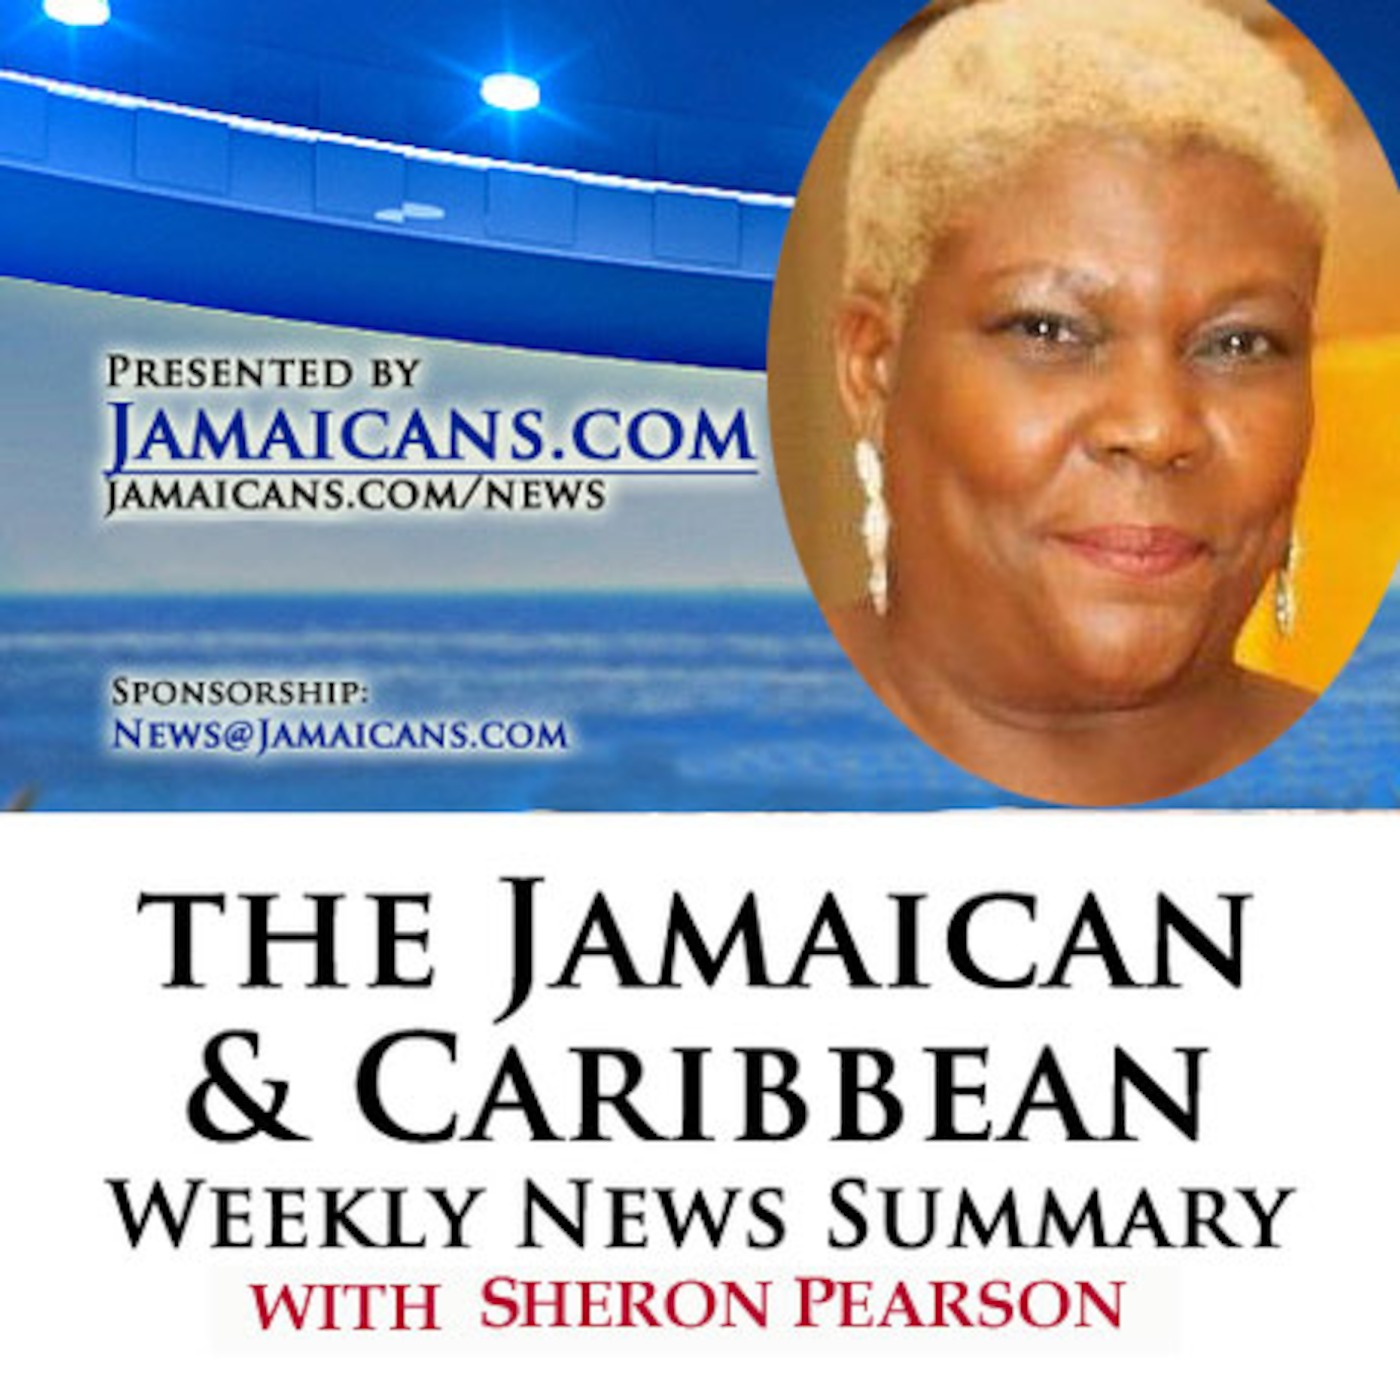 Jamaican and Caribbean Weekly News Summary